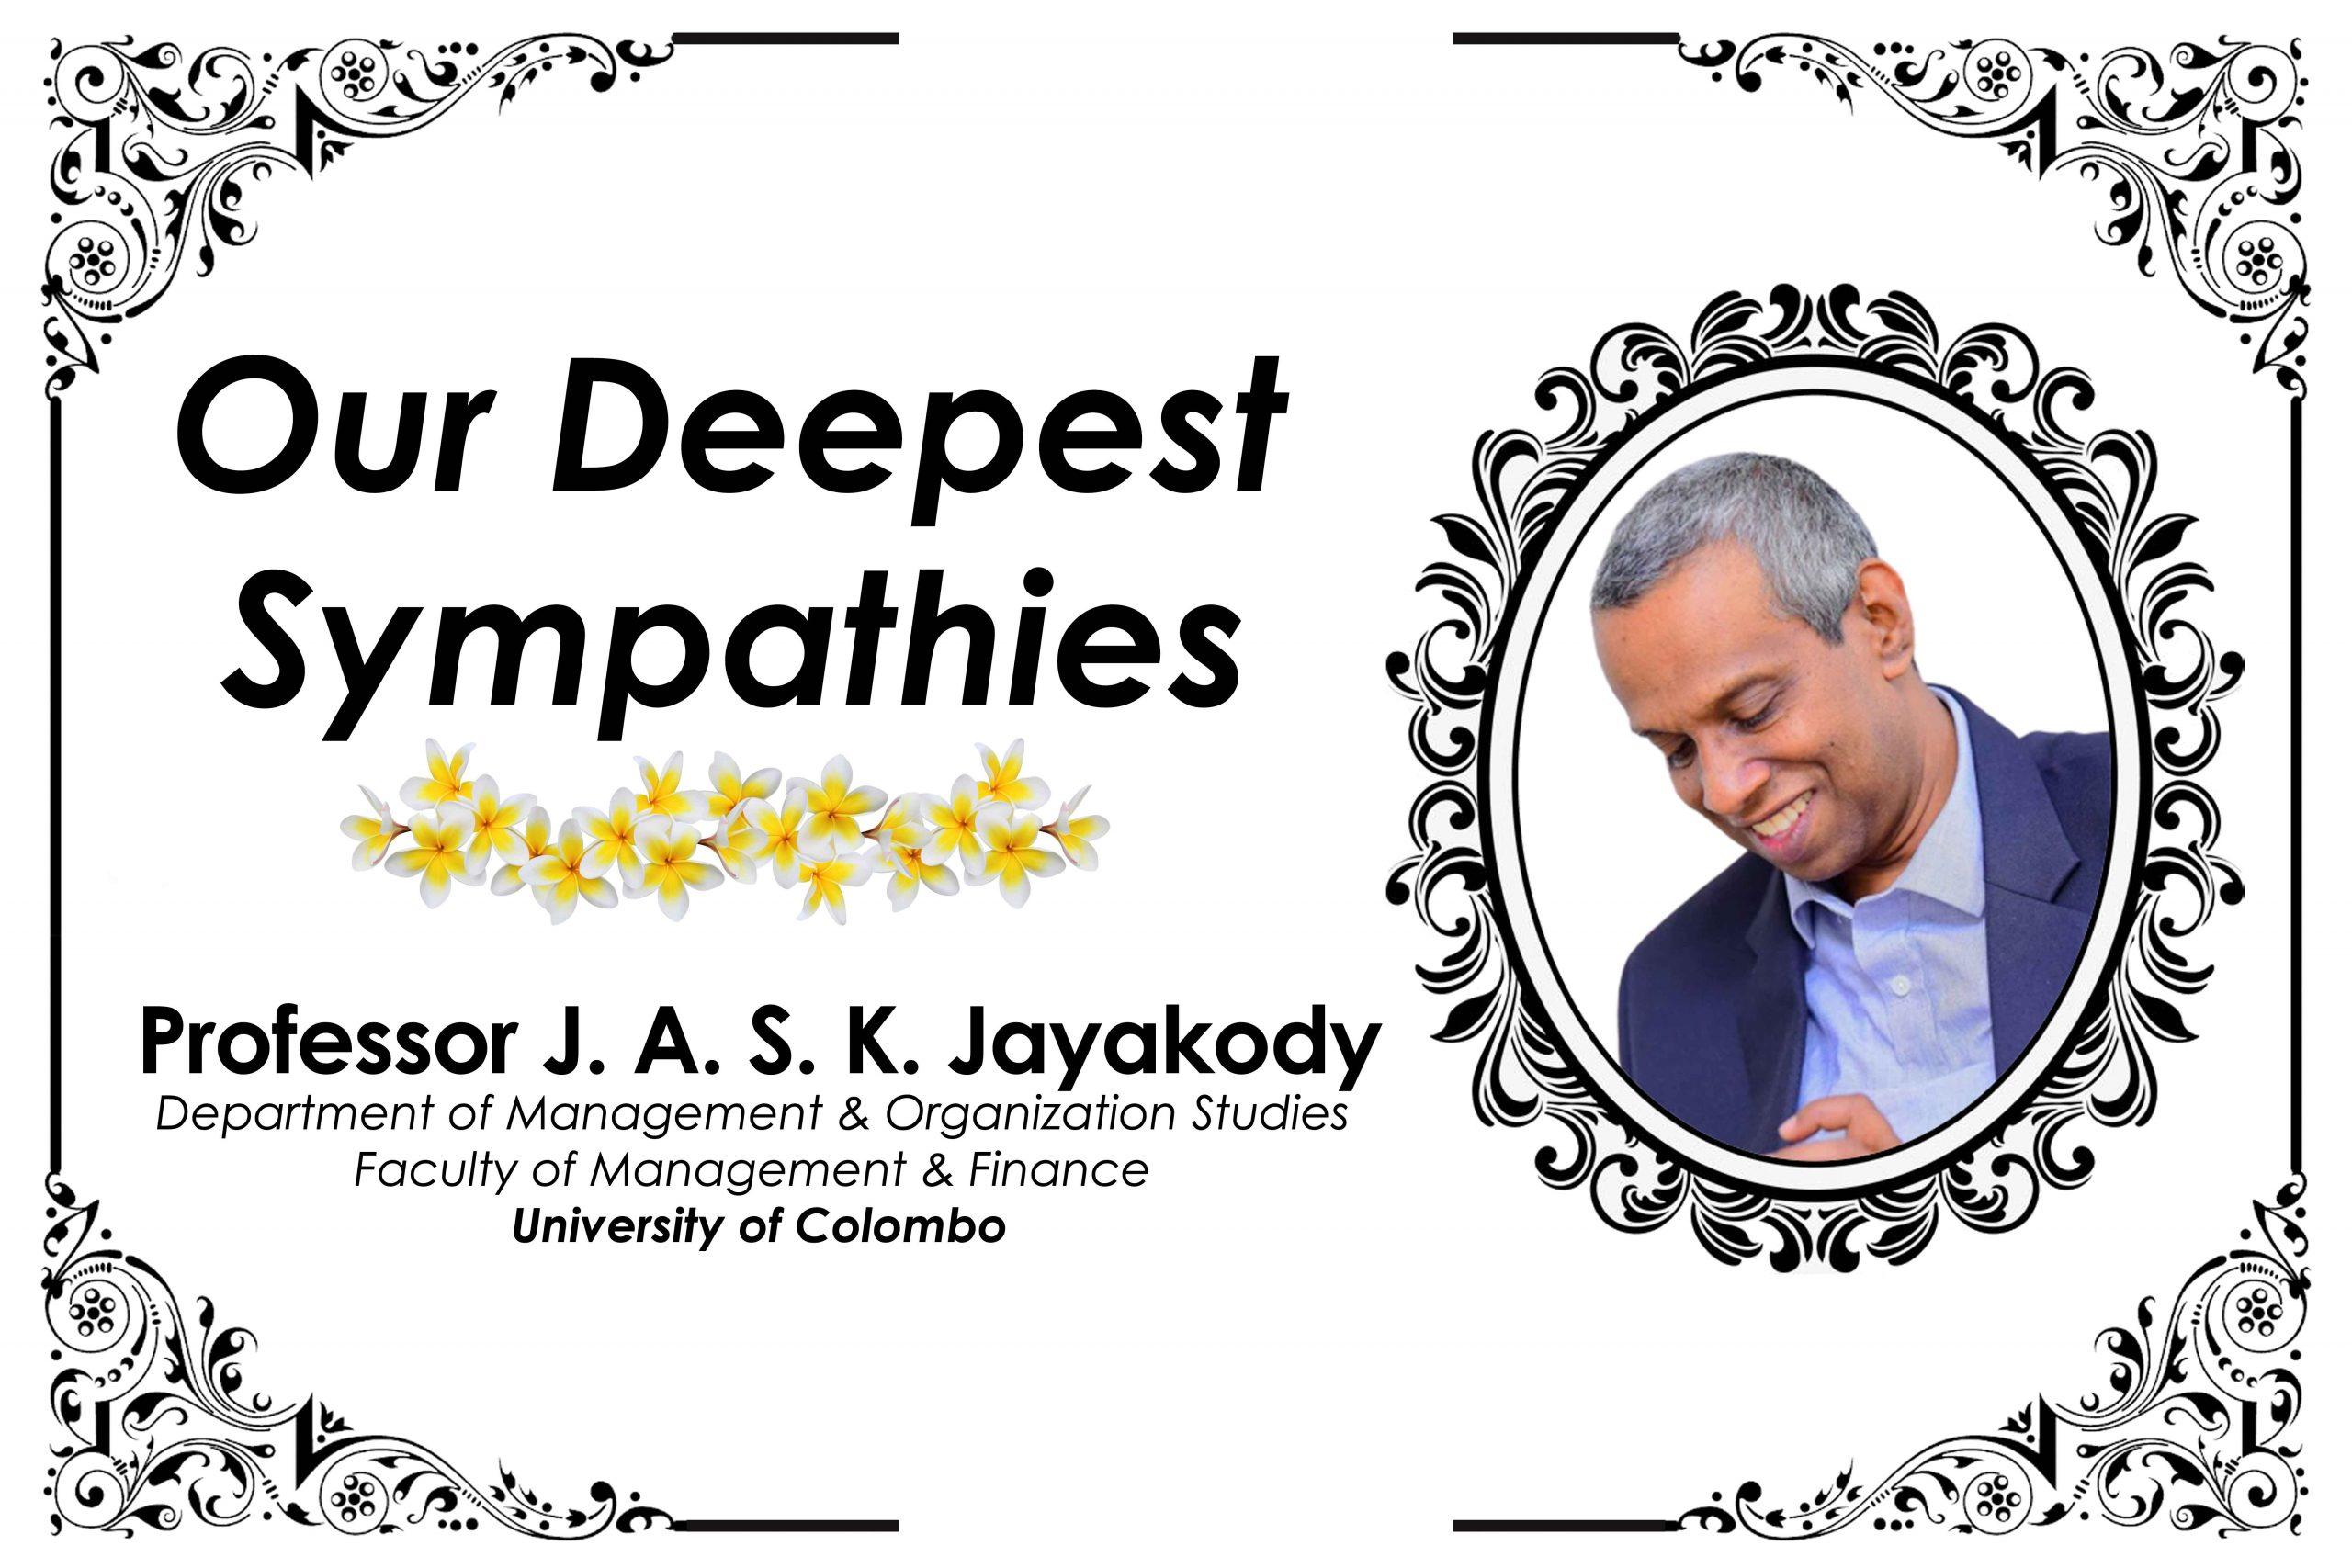 Obituary Notice: Professor J.A.S.K. Jayakody